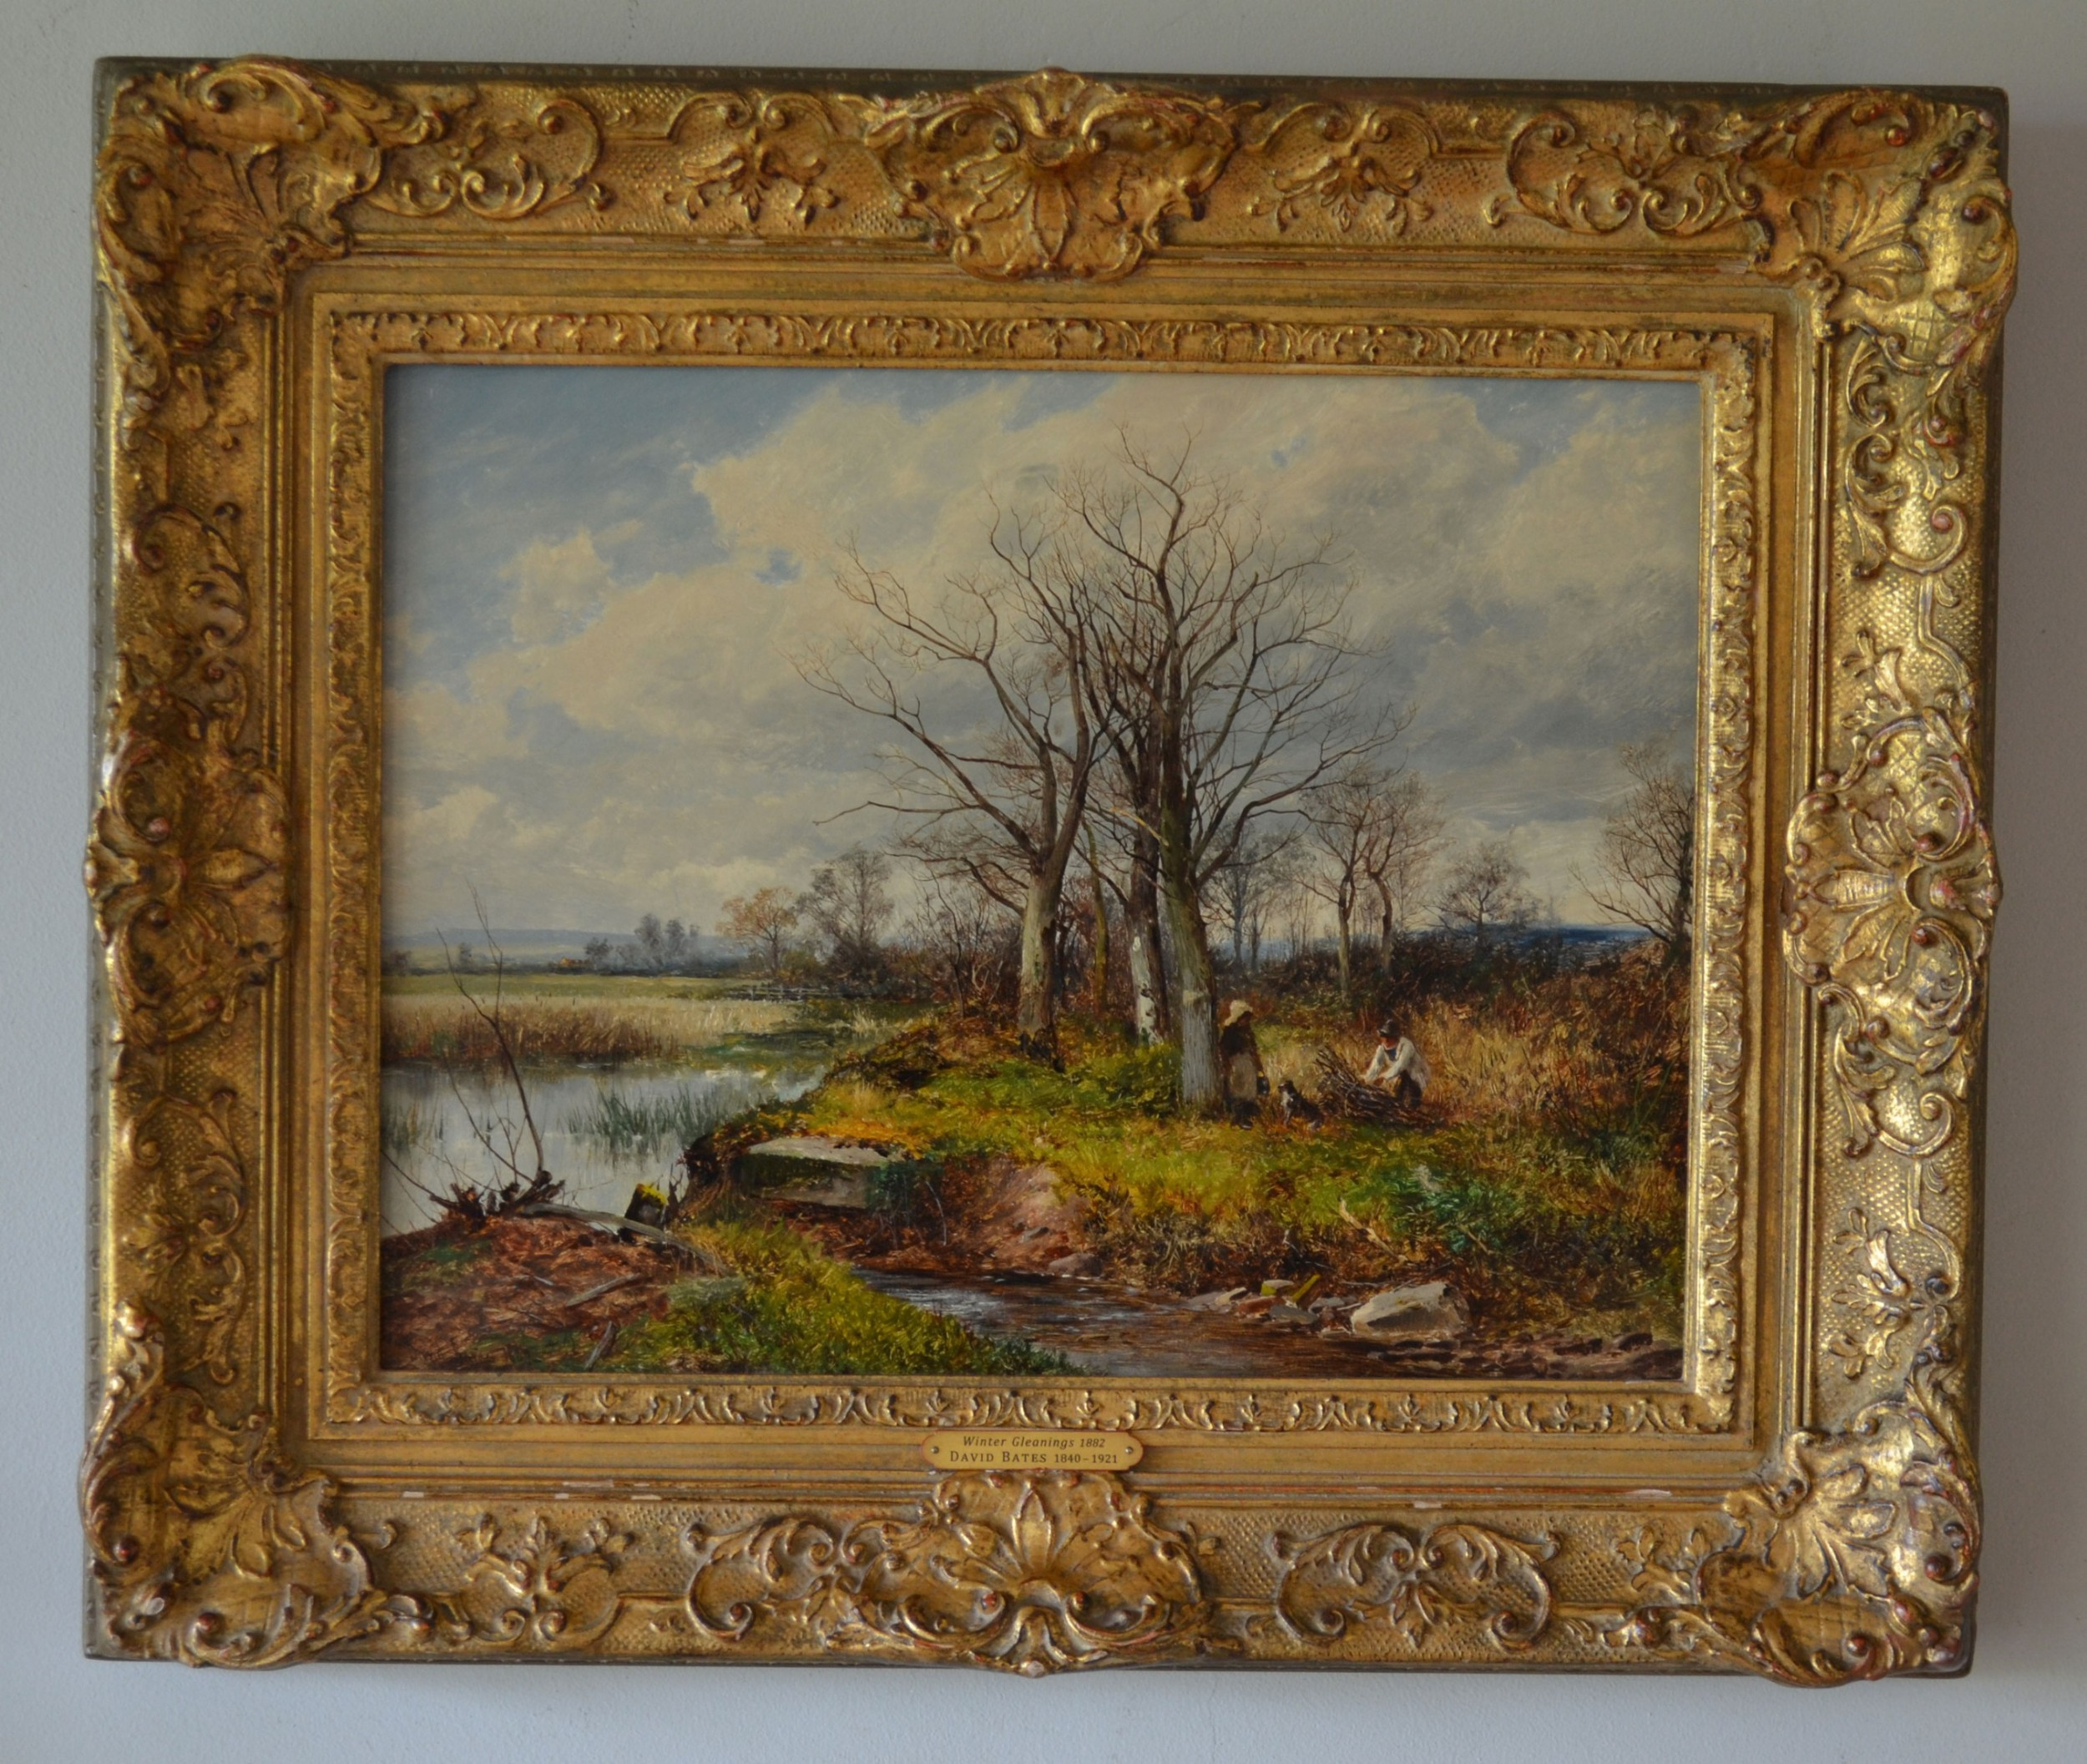 david bates 18401932 english landscape original oil on canvas winter gleanings 1882 signed